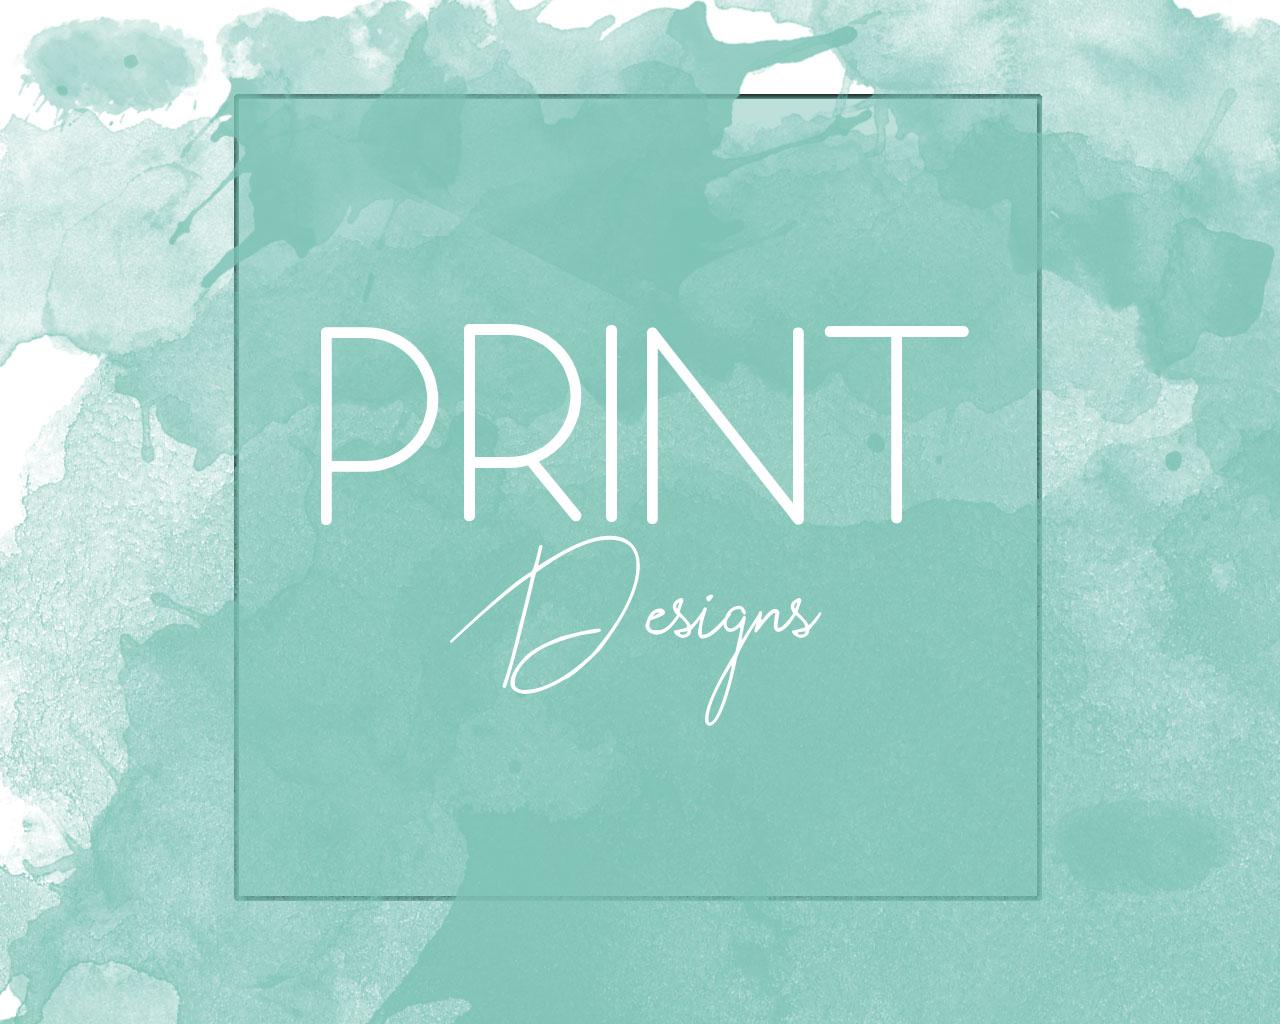 PortfolioHeaders_Print